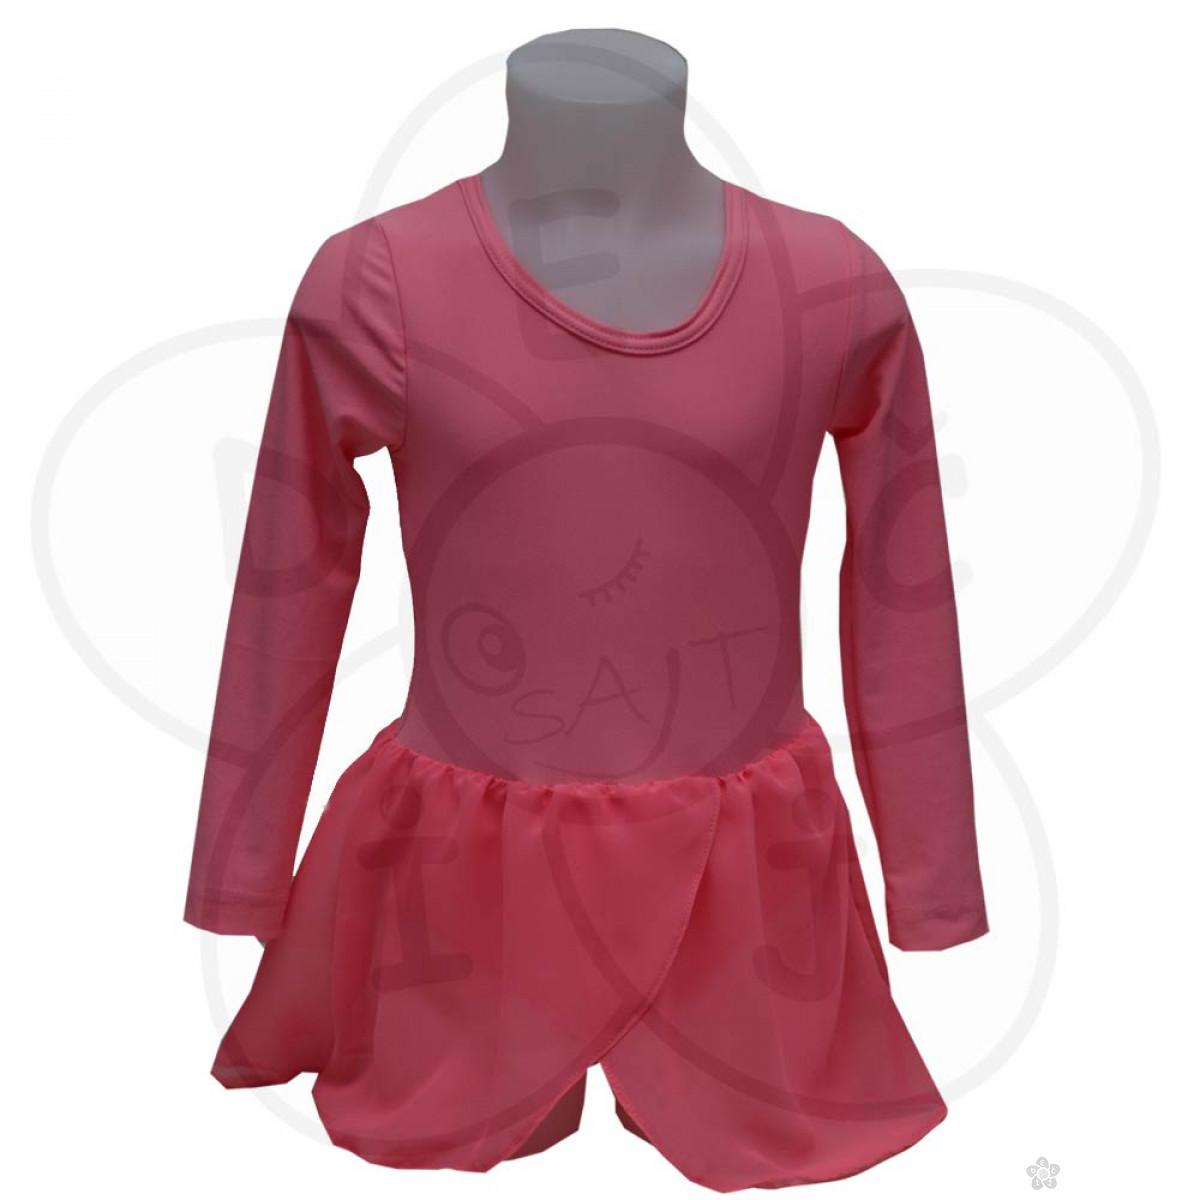 Triko za balet, roze